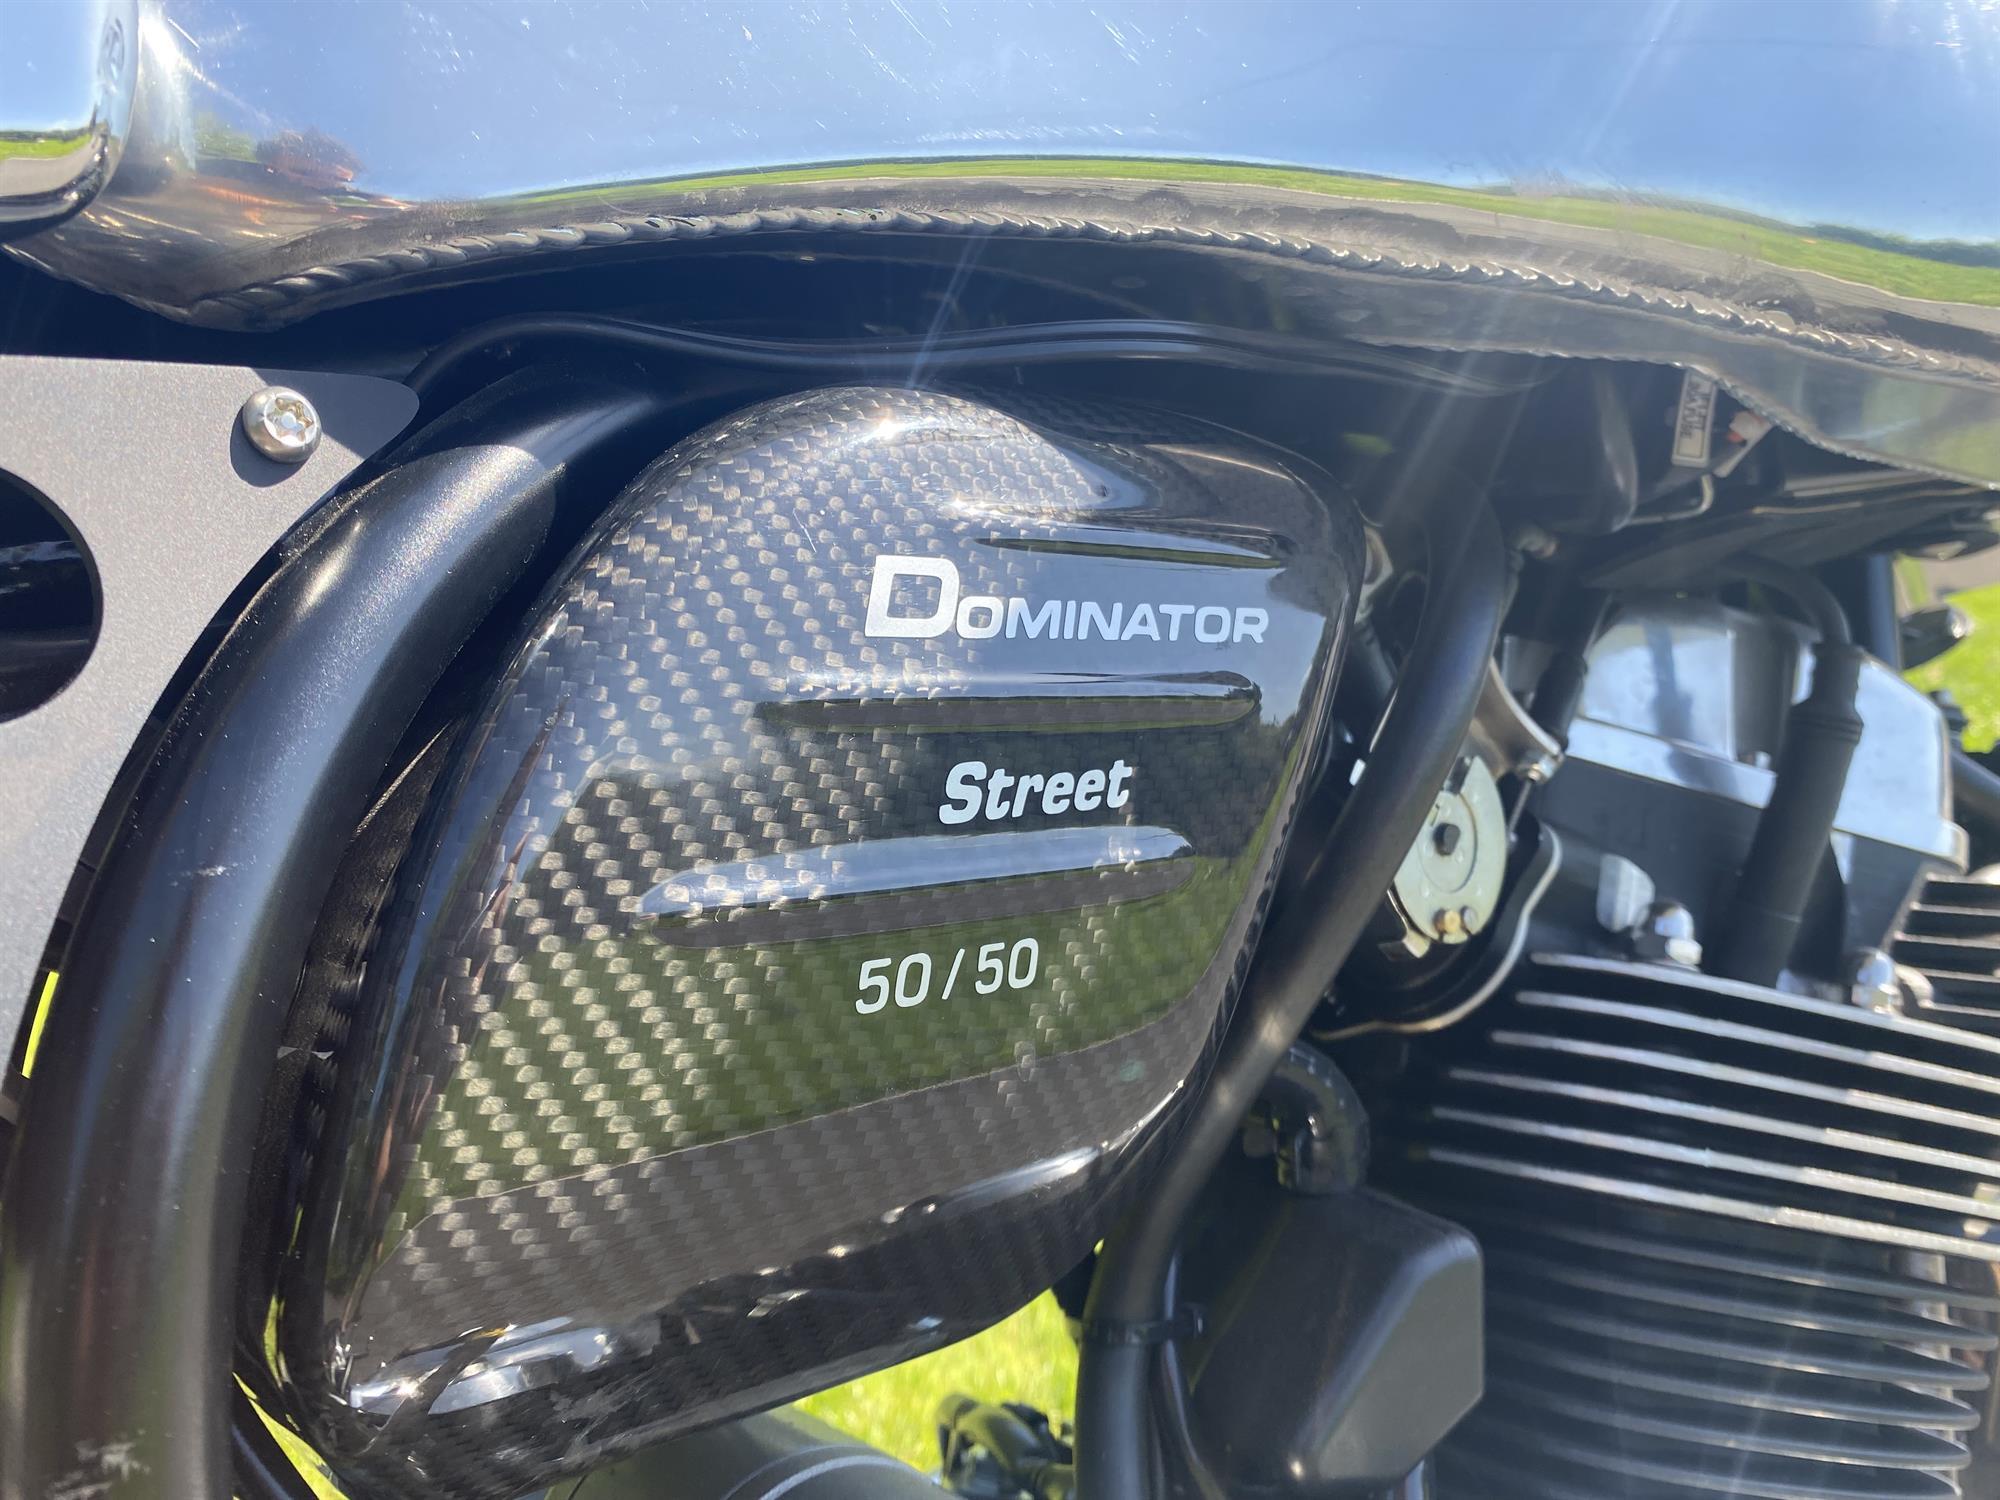 2019 Norton Dominator 961 Street Limited Edition - Image 6 of 7